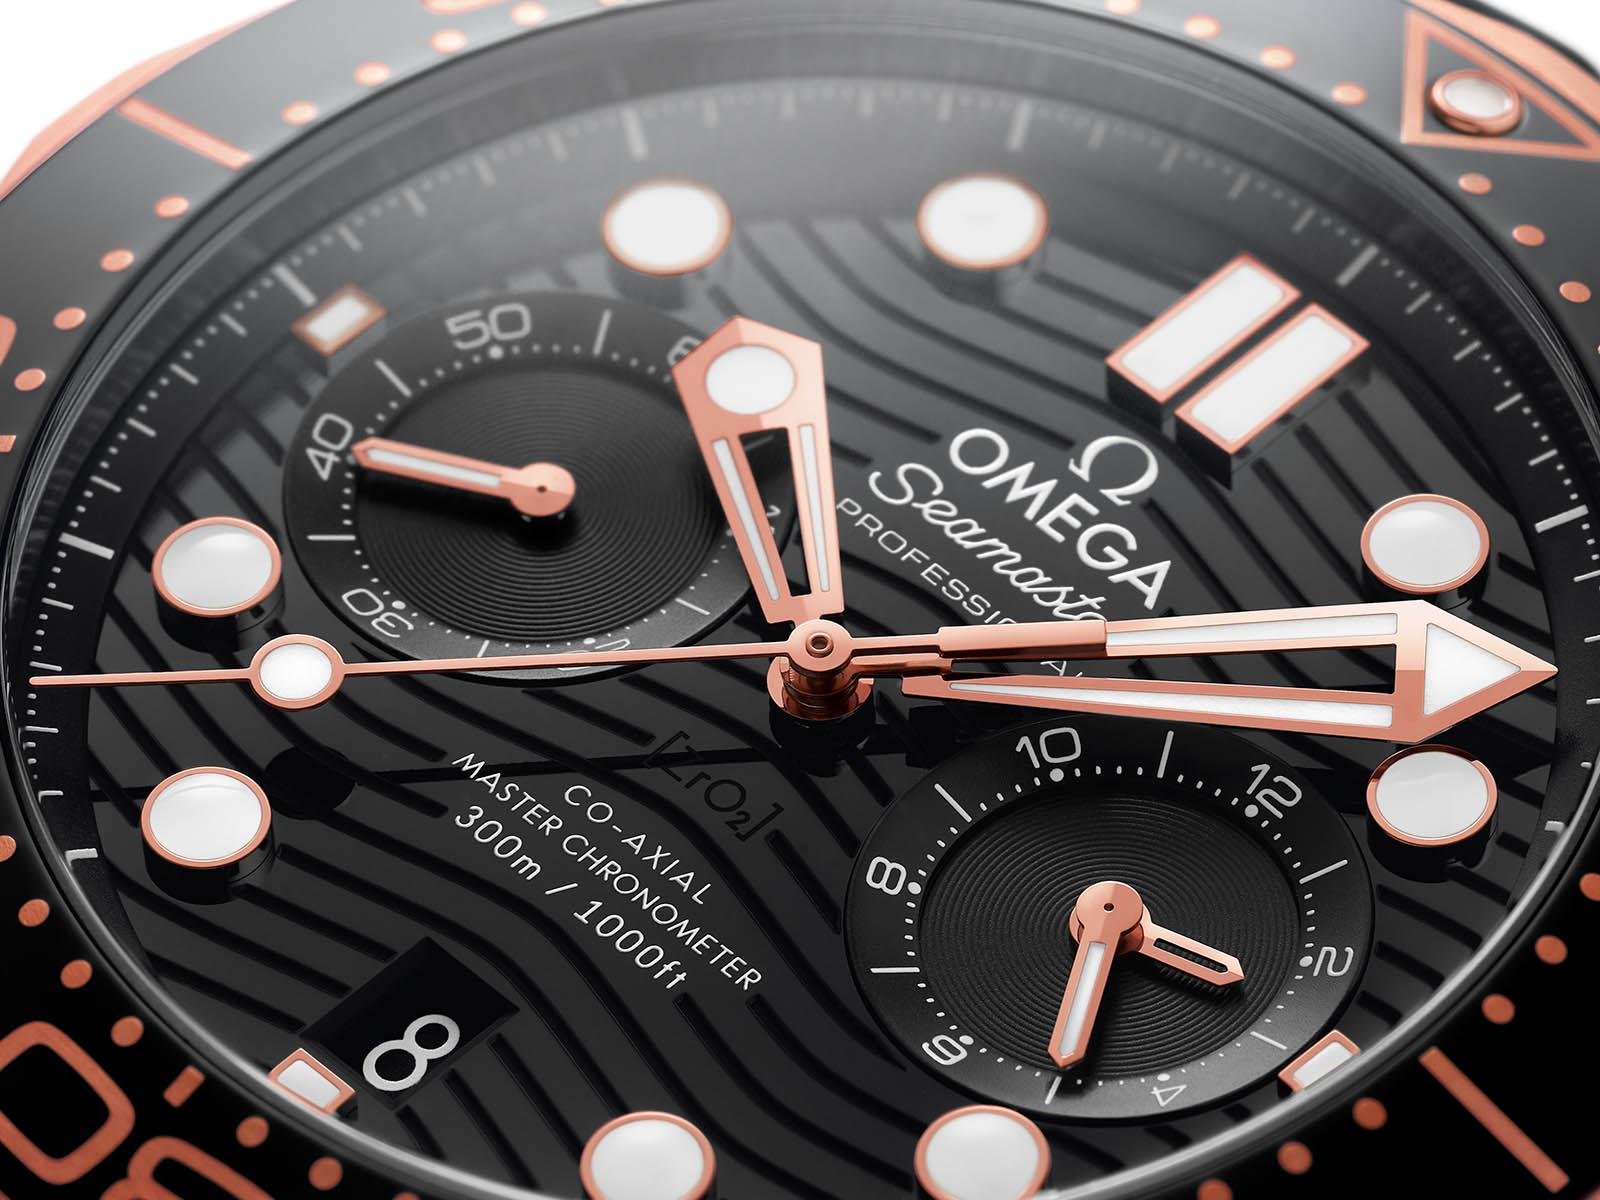 210-22-44-51-01-001-omega-seamaster-diver-300m-chronograph-4.jpg